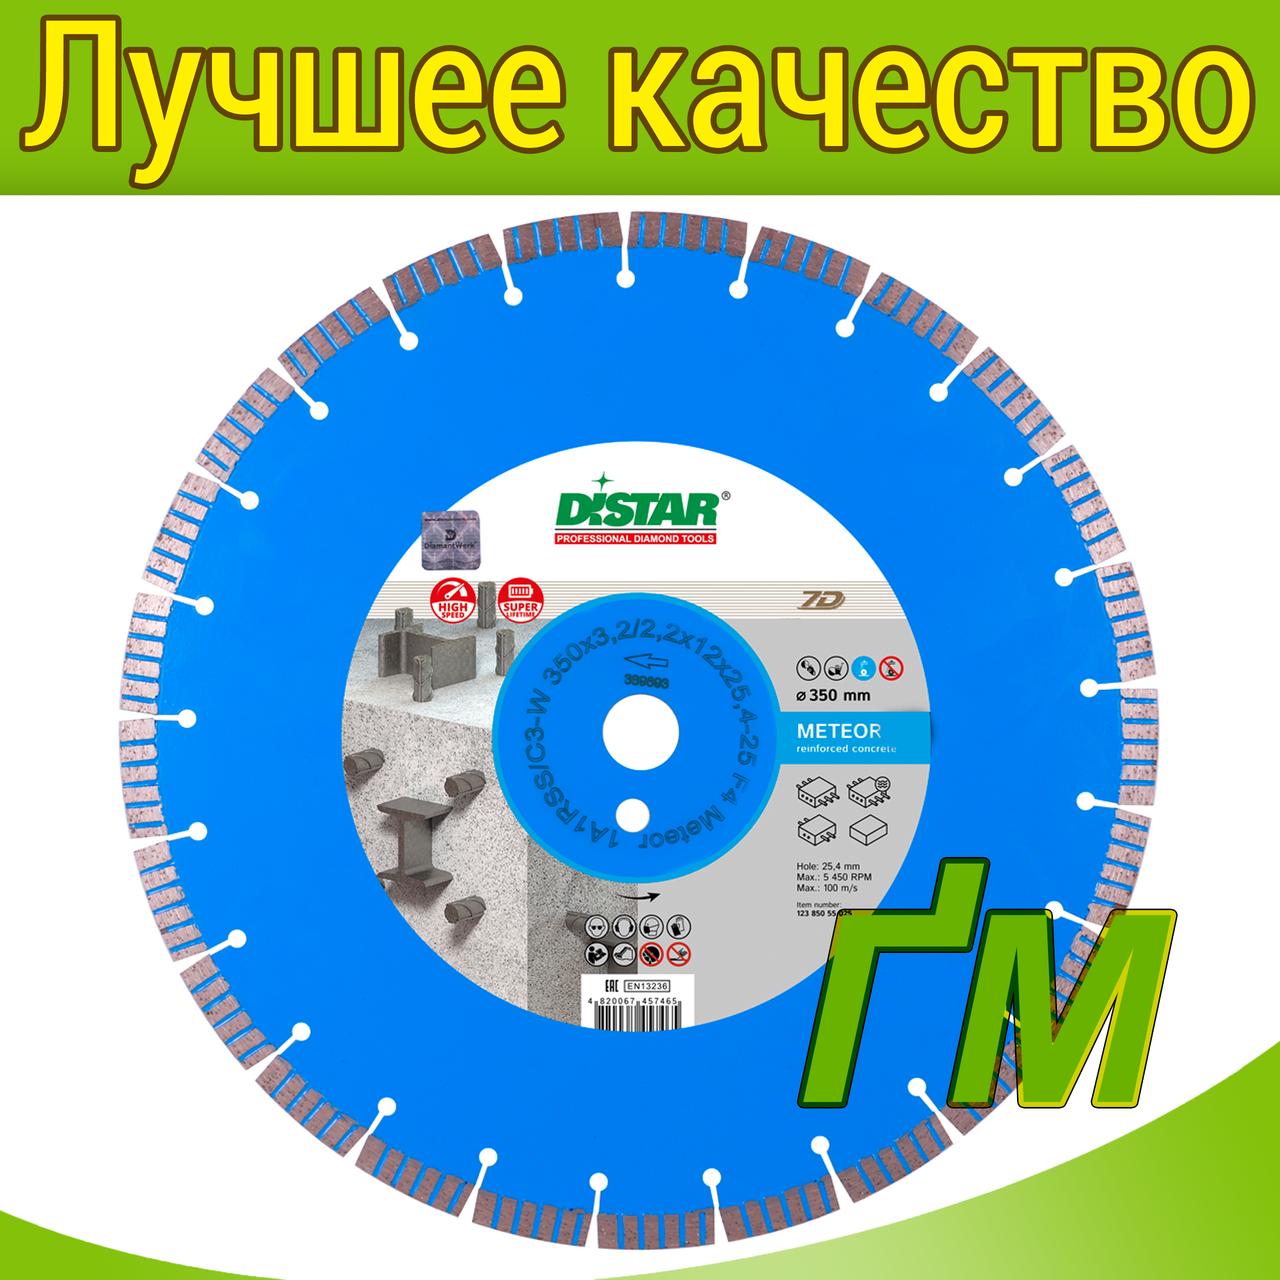 Диски алмазные для бензорезов и швонарезчиков Meteor 1A1RSS/C3-W 600x4,5/3,5x12x25,4-42 F4